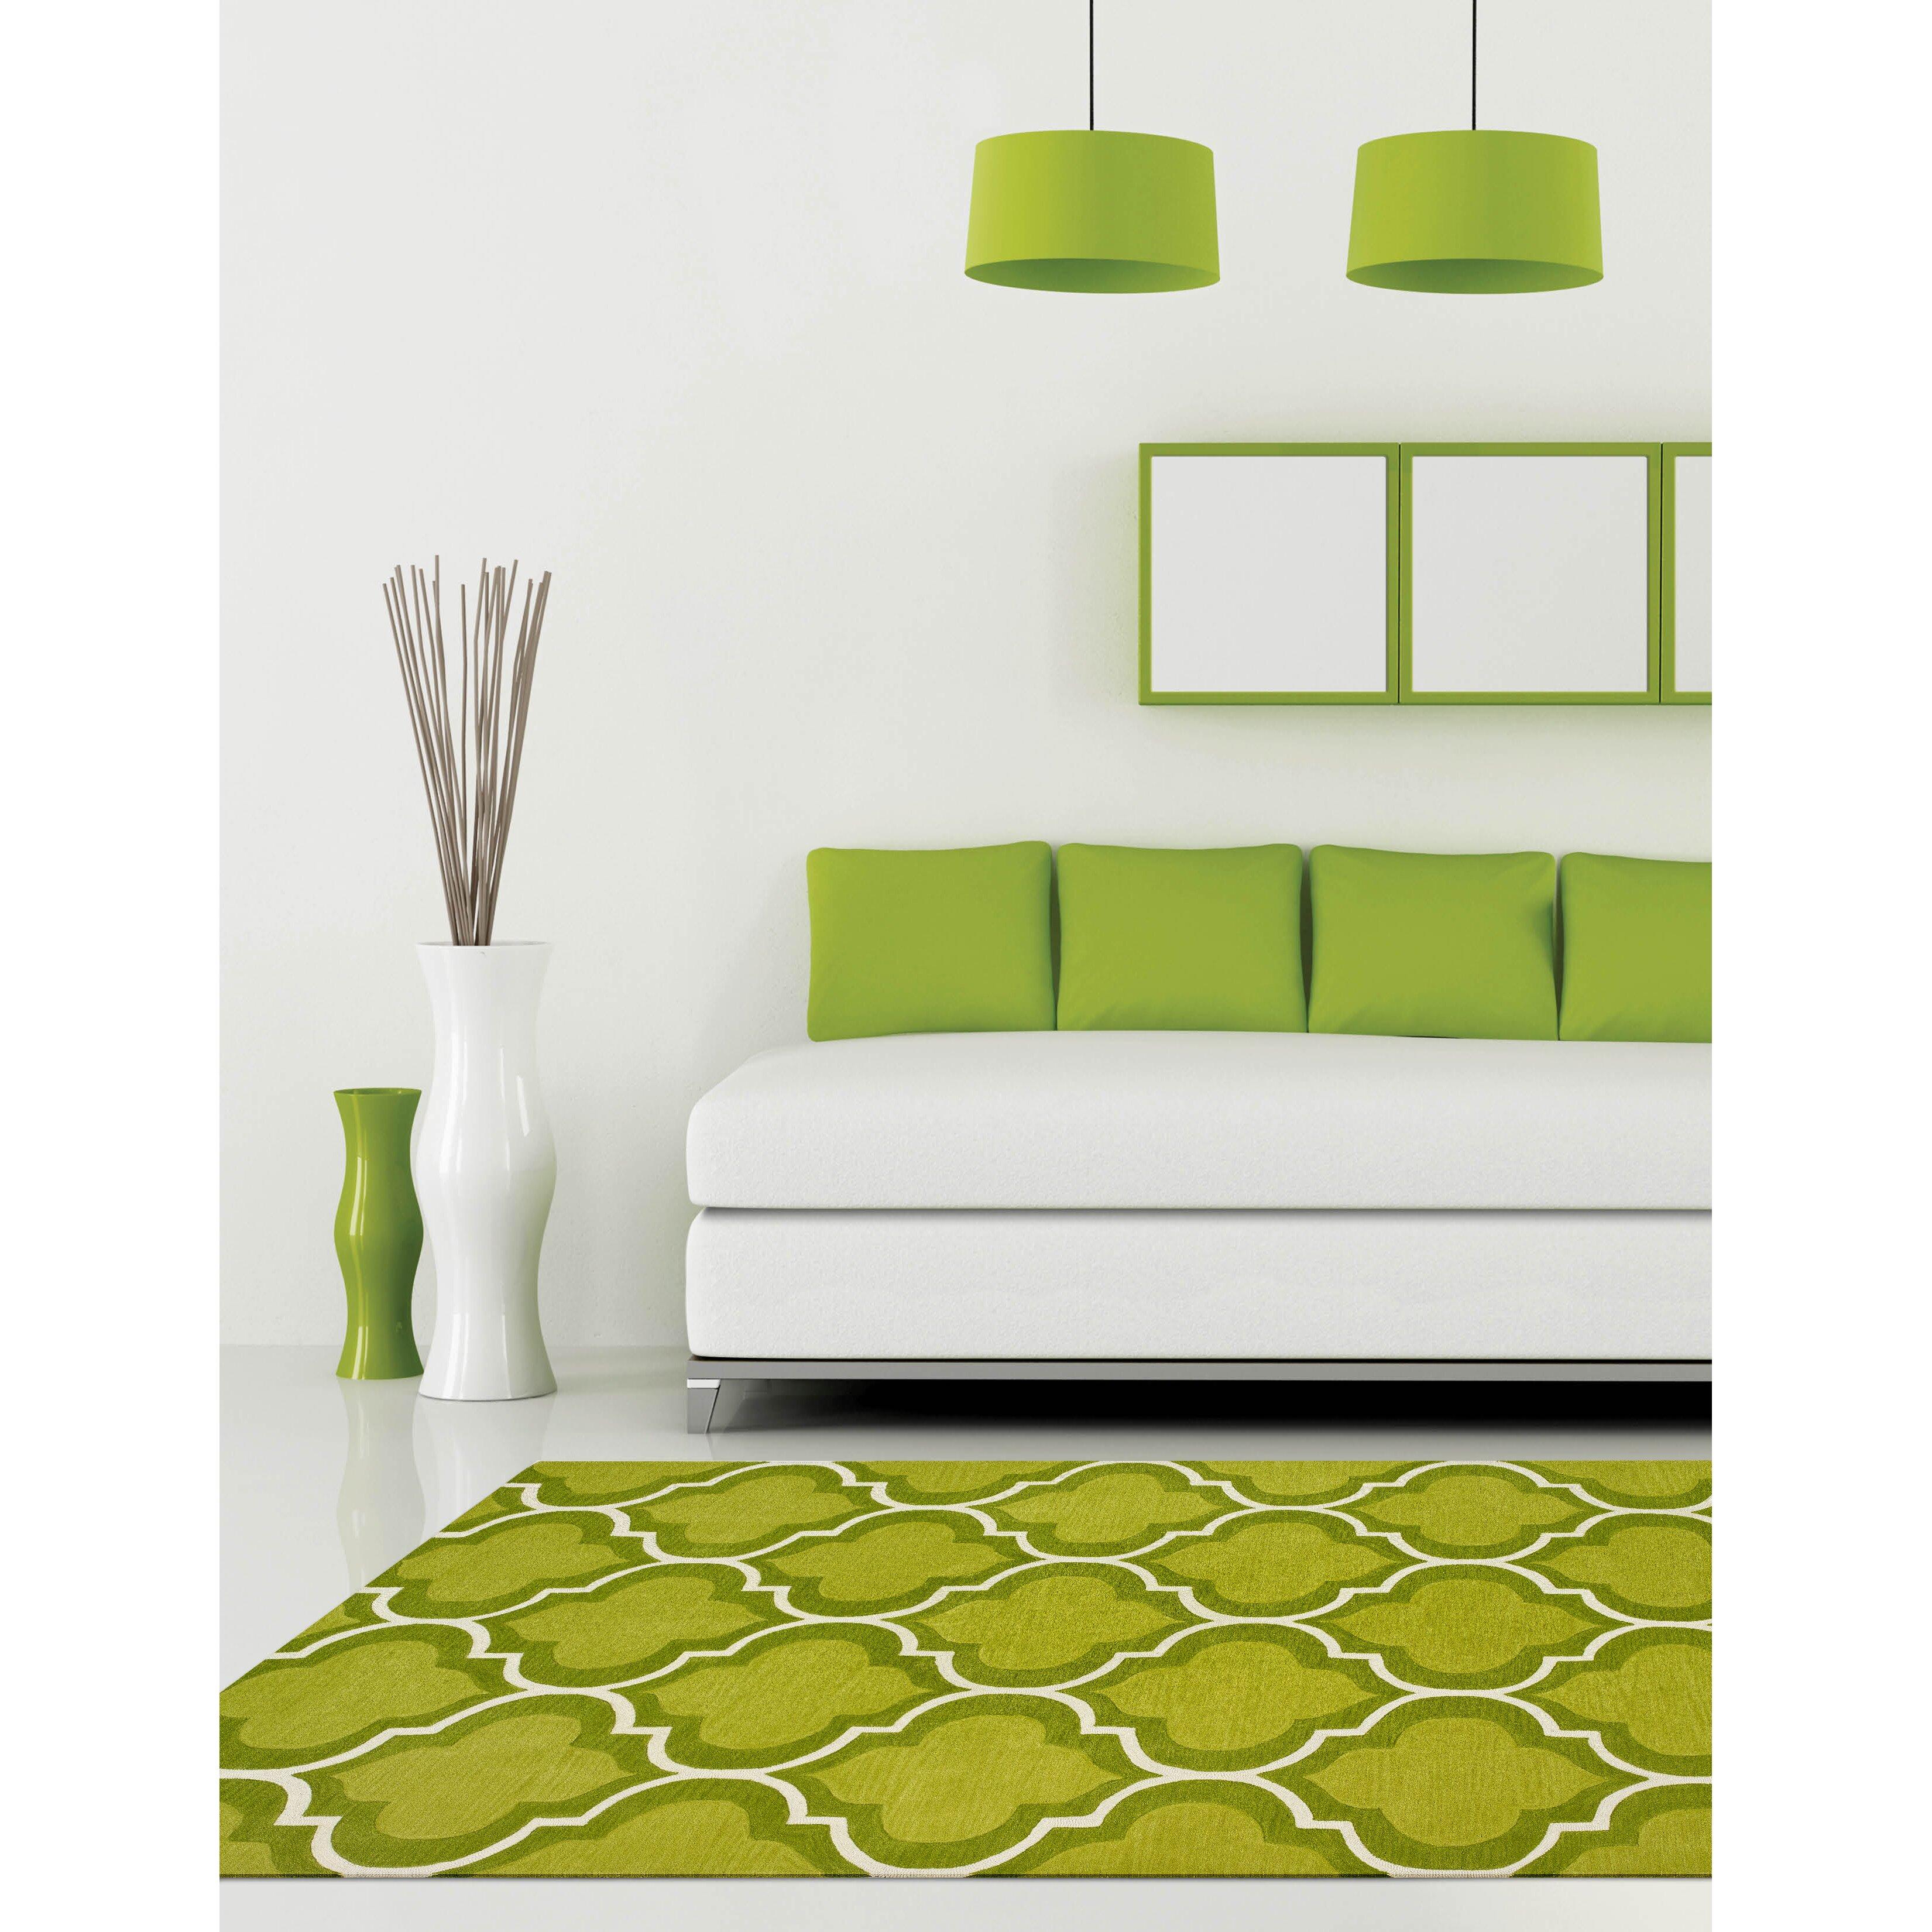 Nebraska Furniture Mart On Pinterest Furniture Area Rugs And Chairs